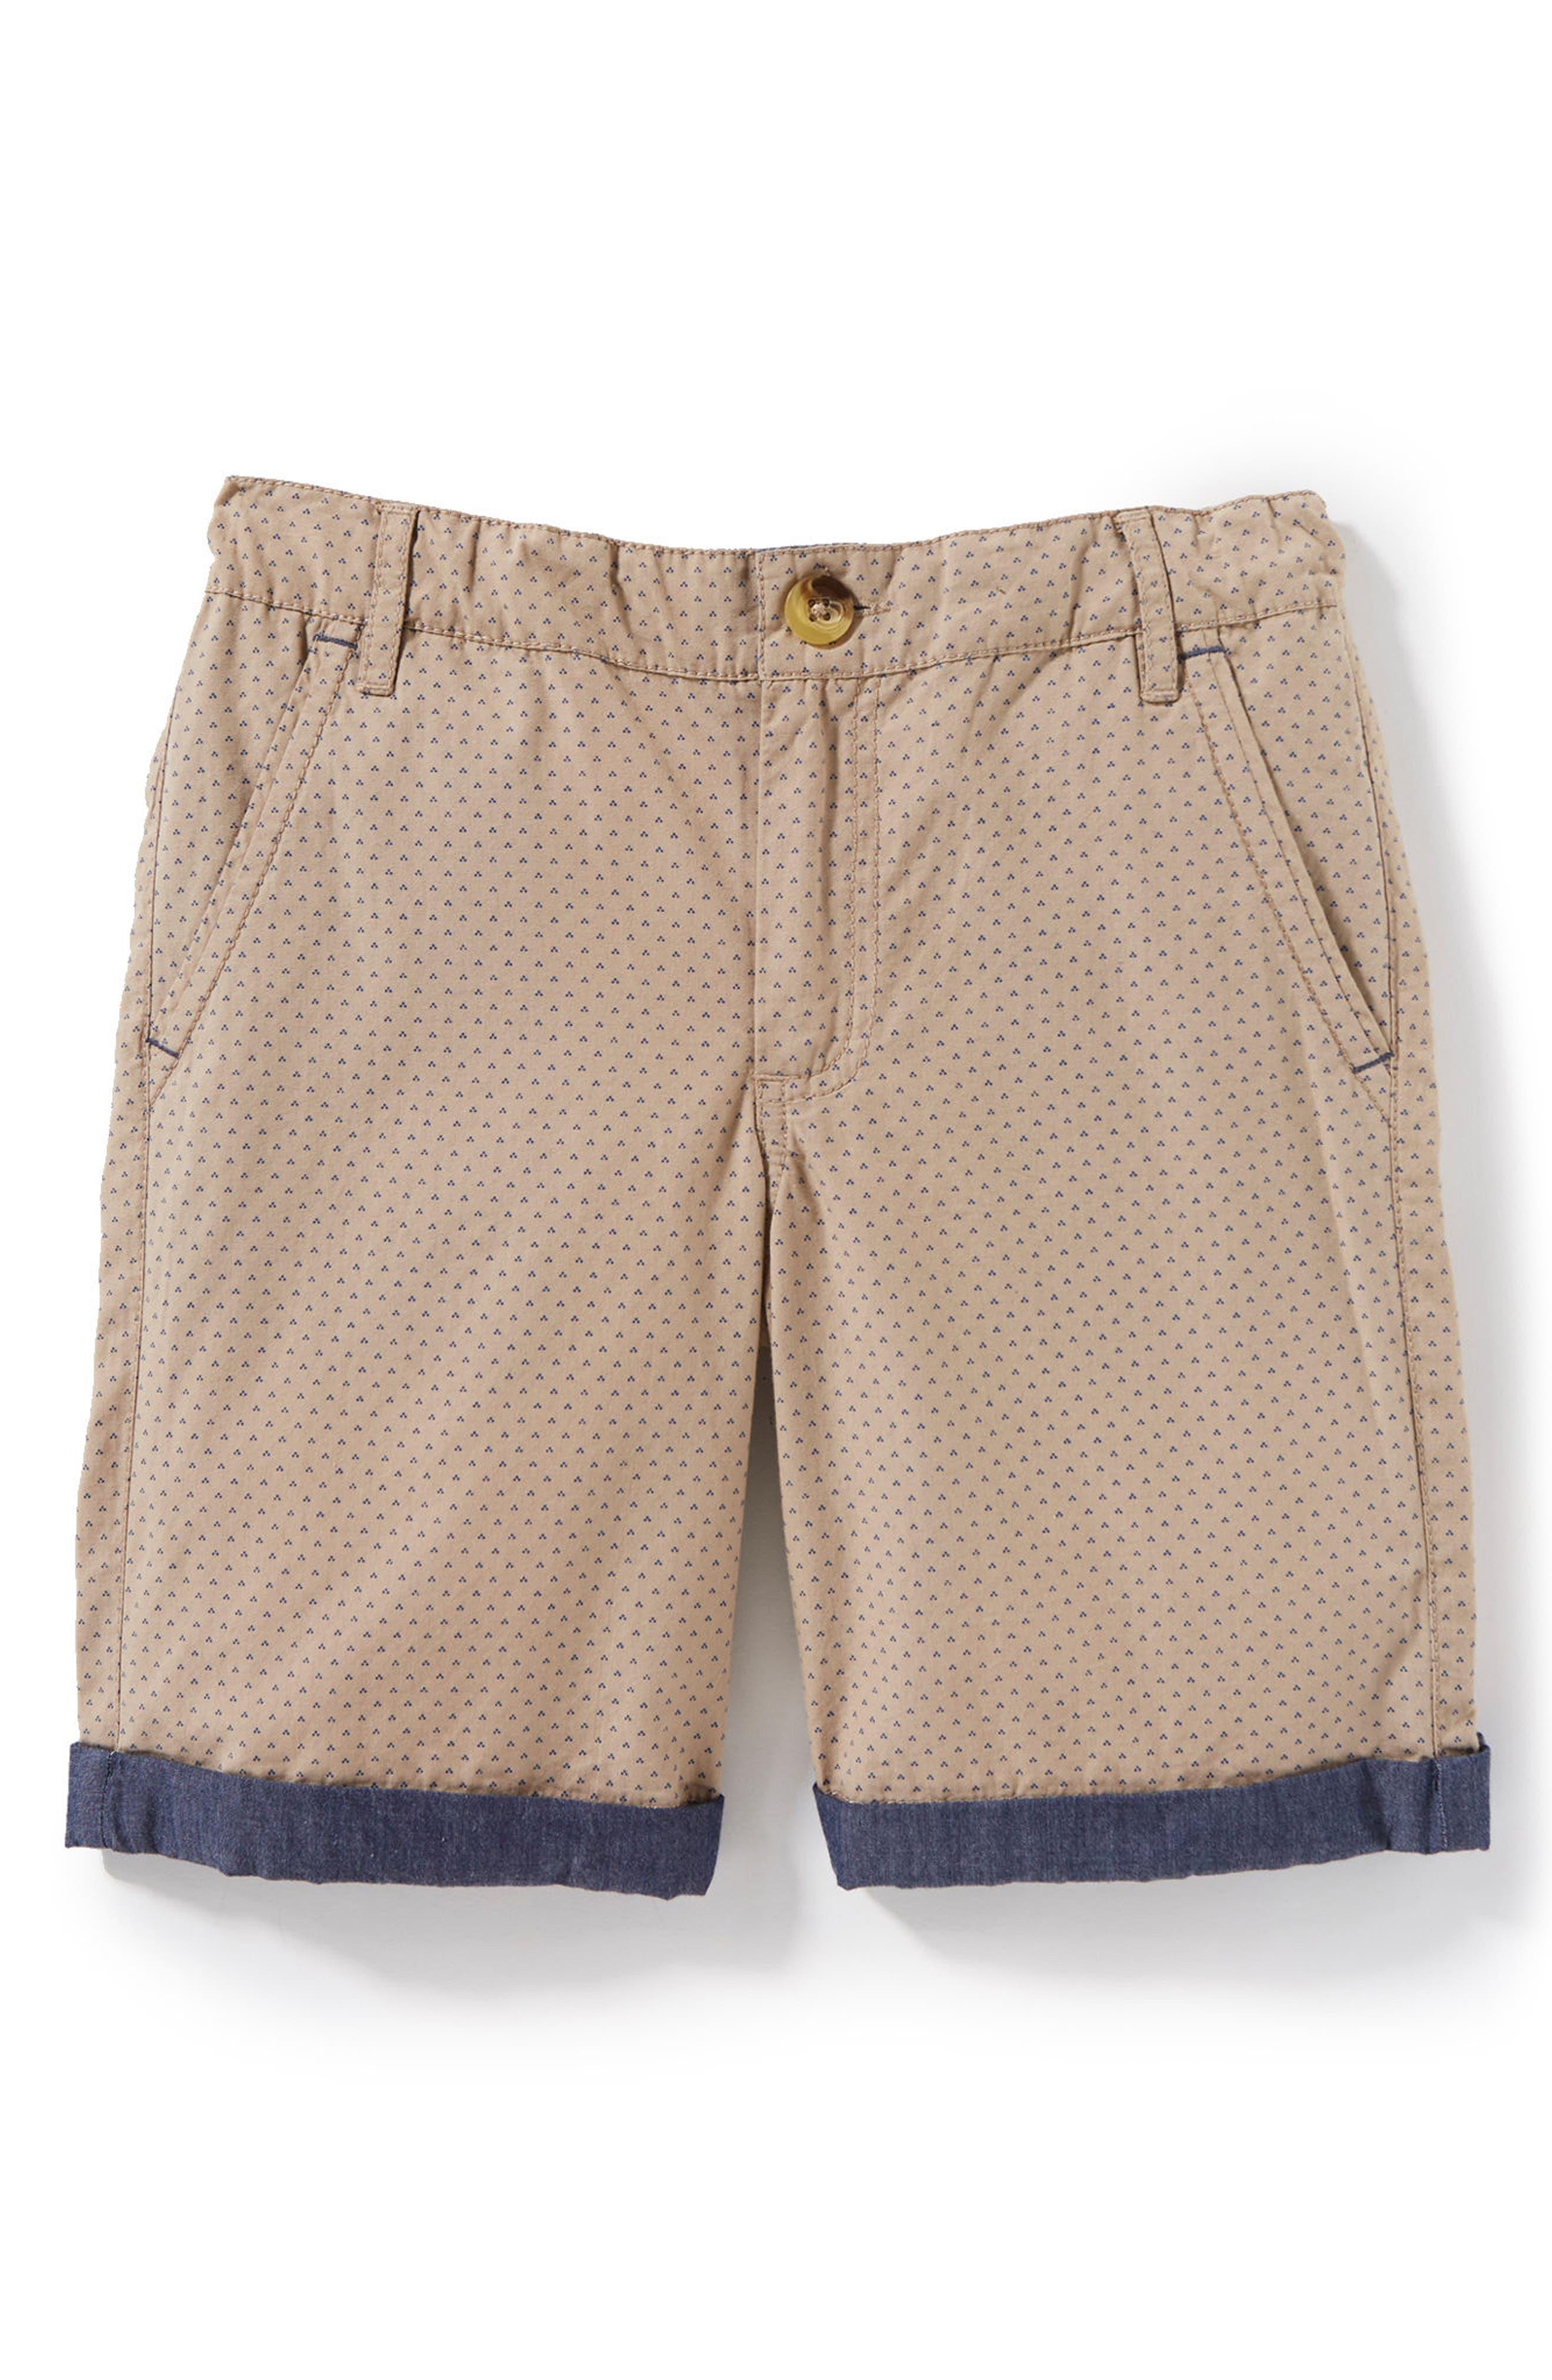 Alternate Image 1 Selected - Peek Drew Shorts (Toddler Boys, Little Boys & Big Boys)